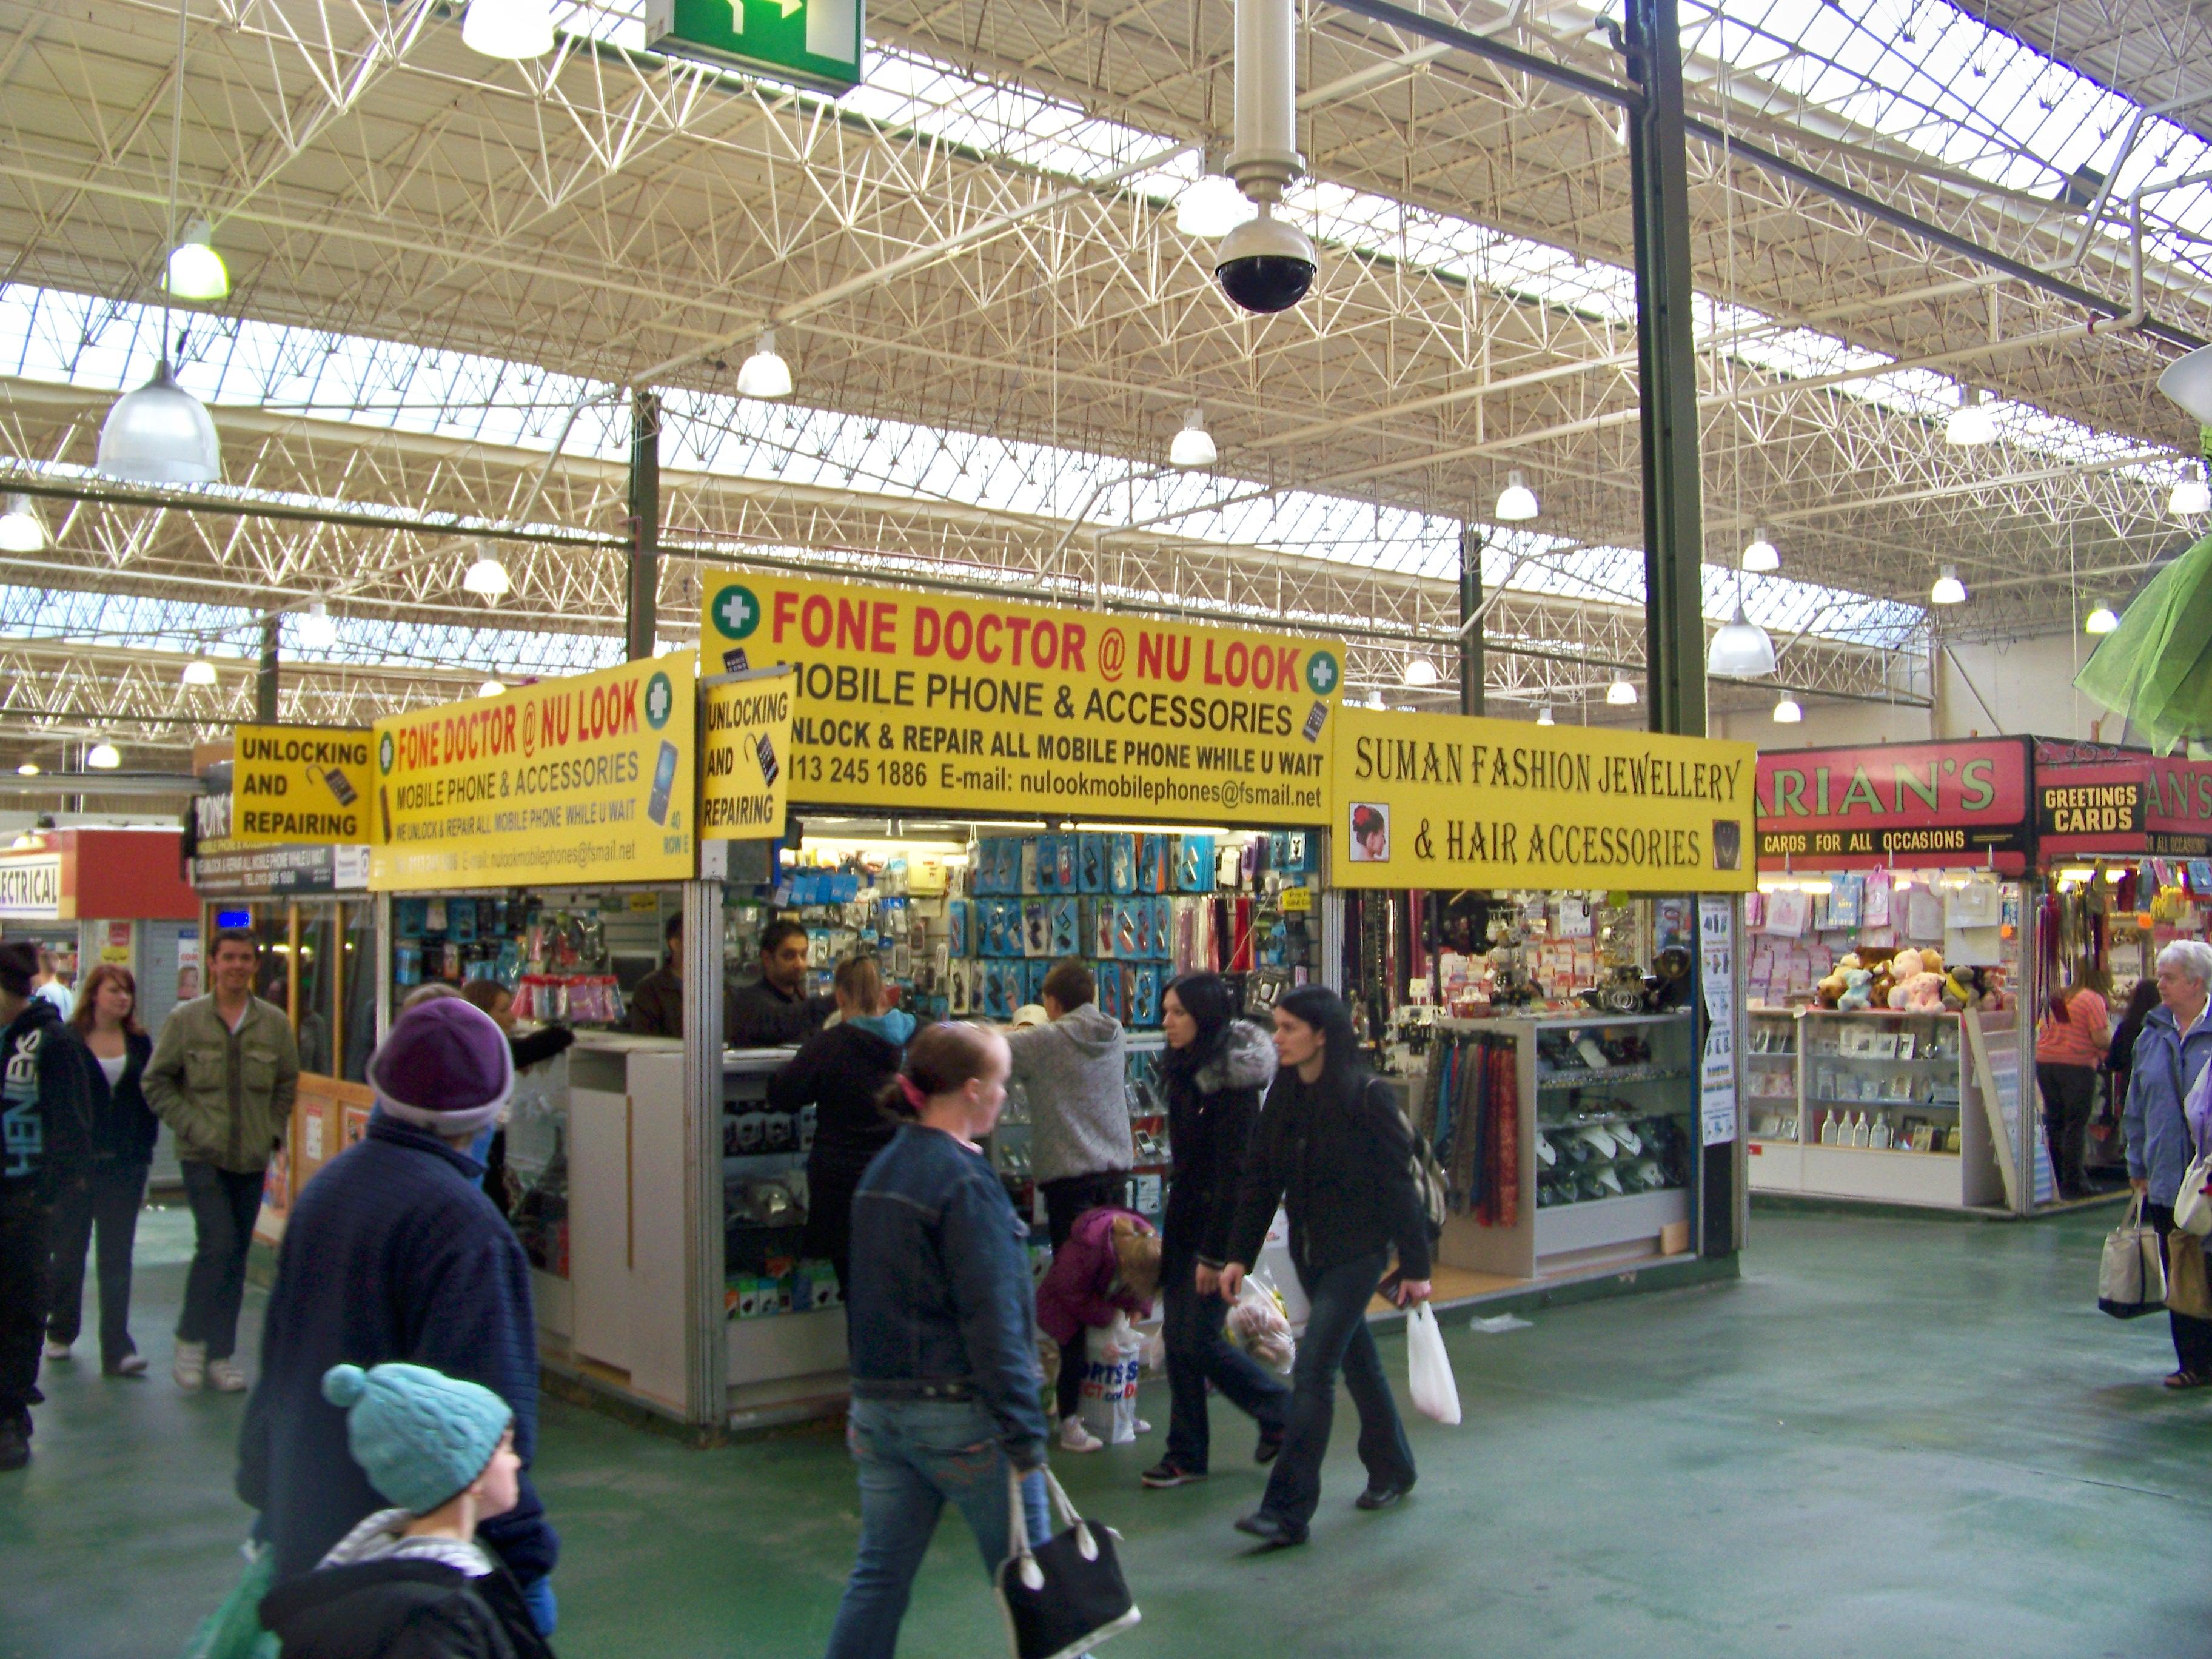 File:Kirkgate Market interior 001.jpg - Wikimedia Commons